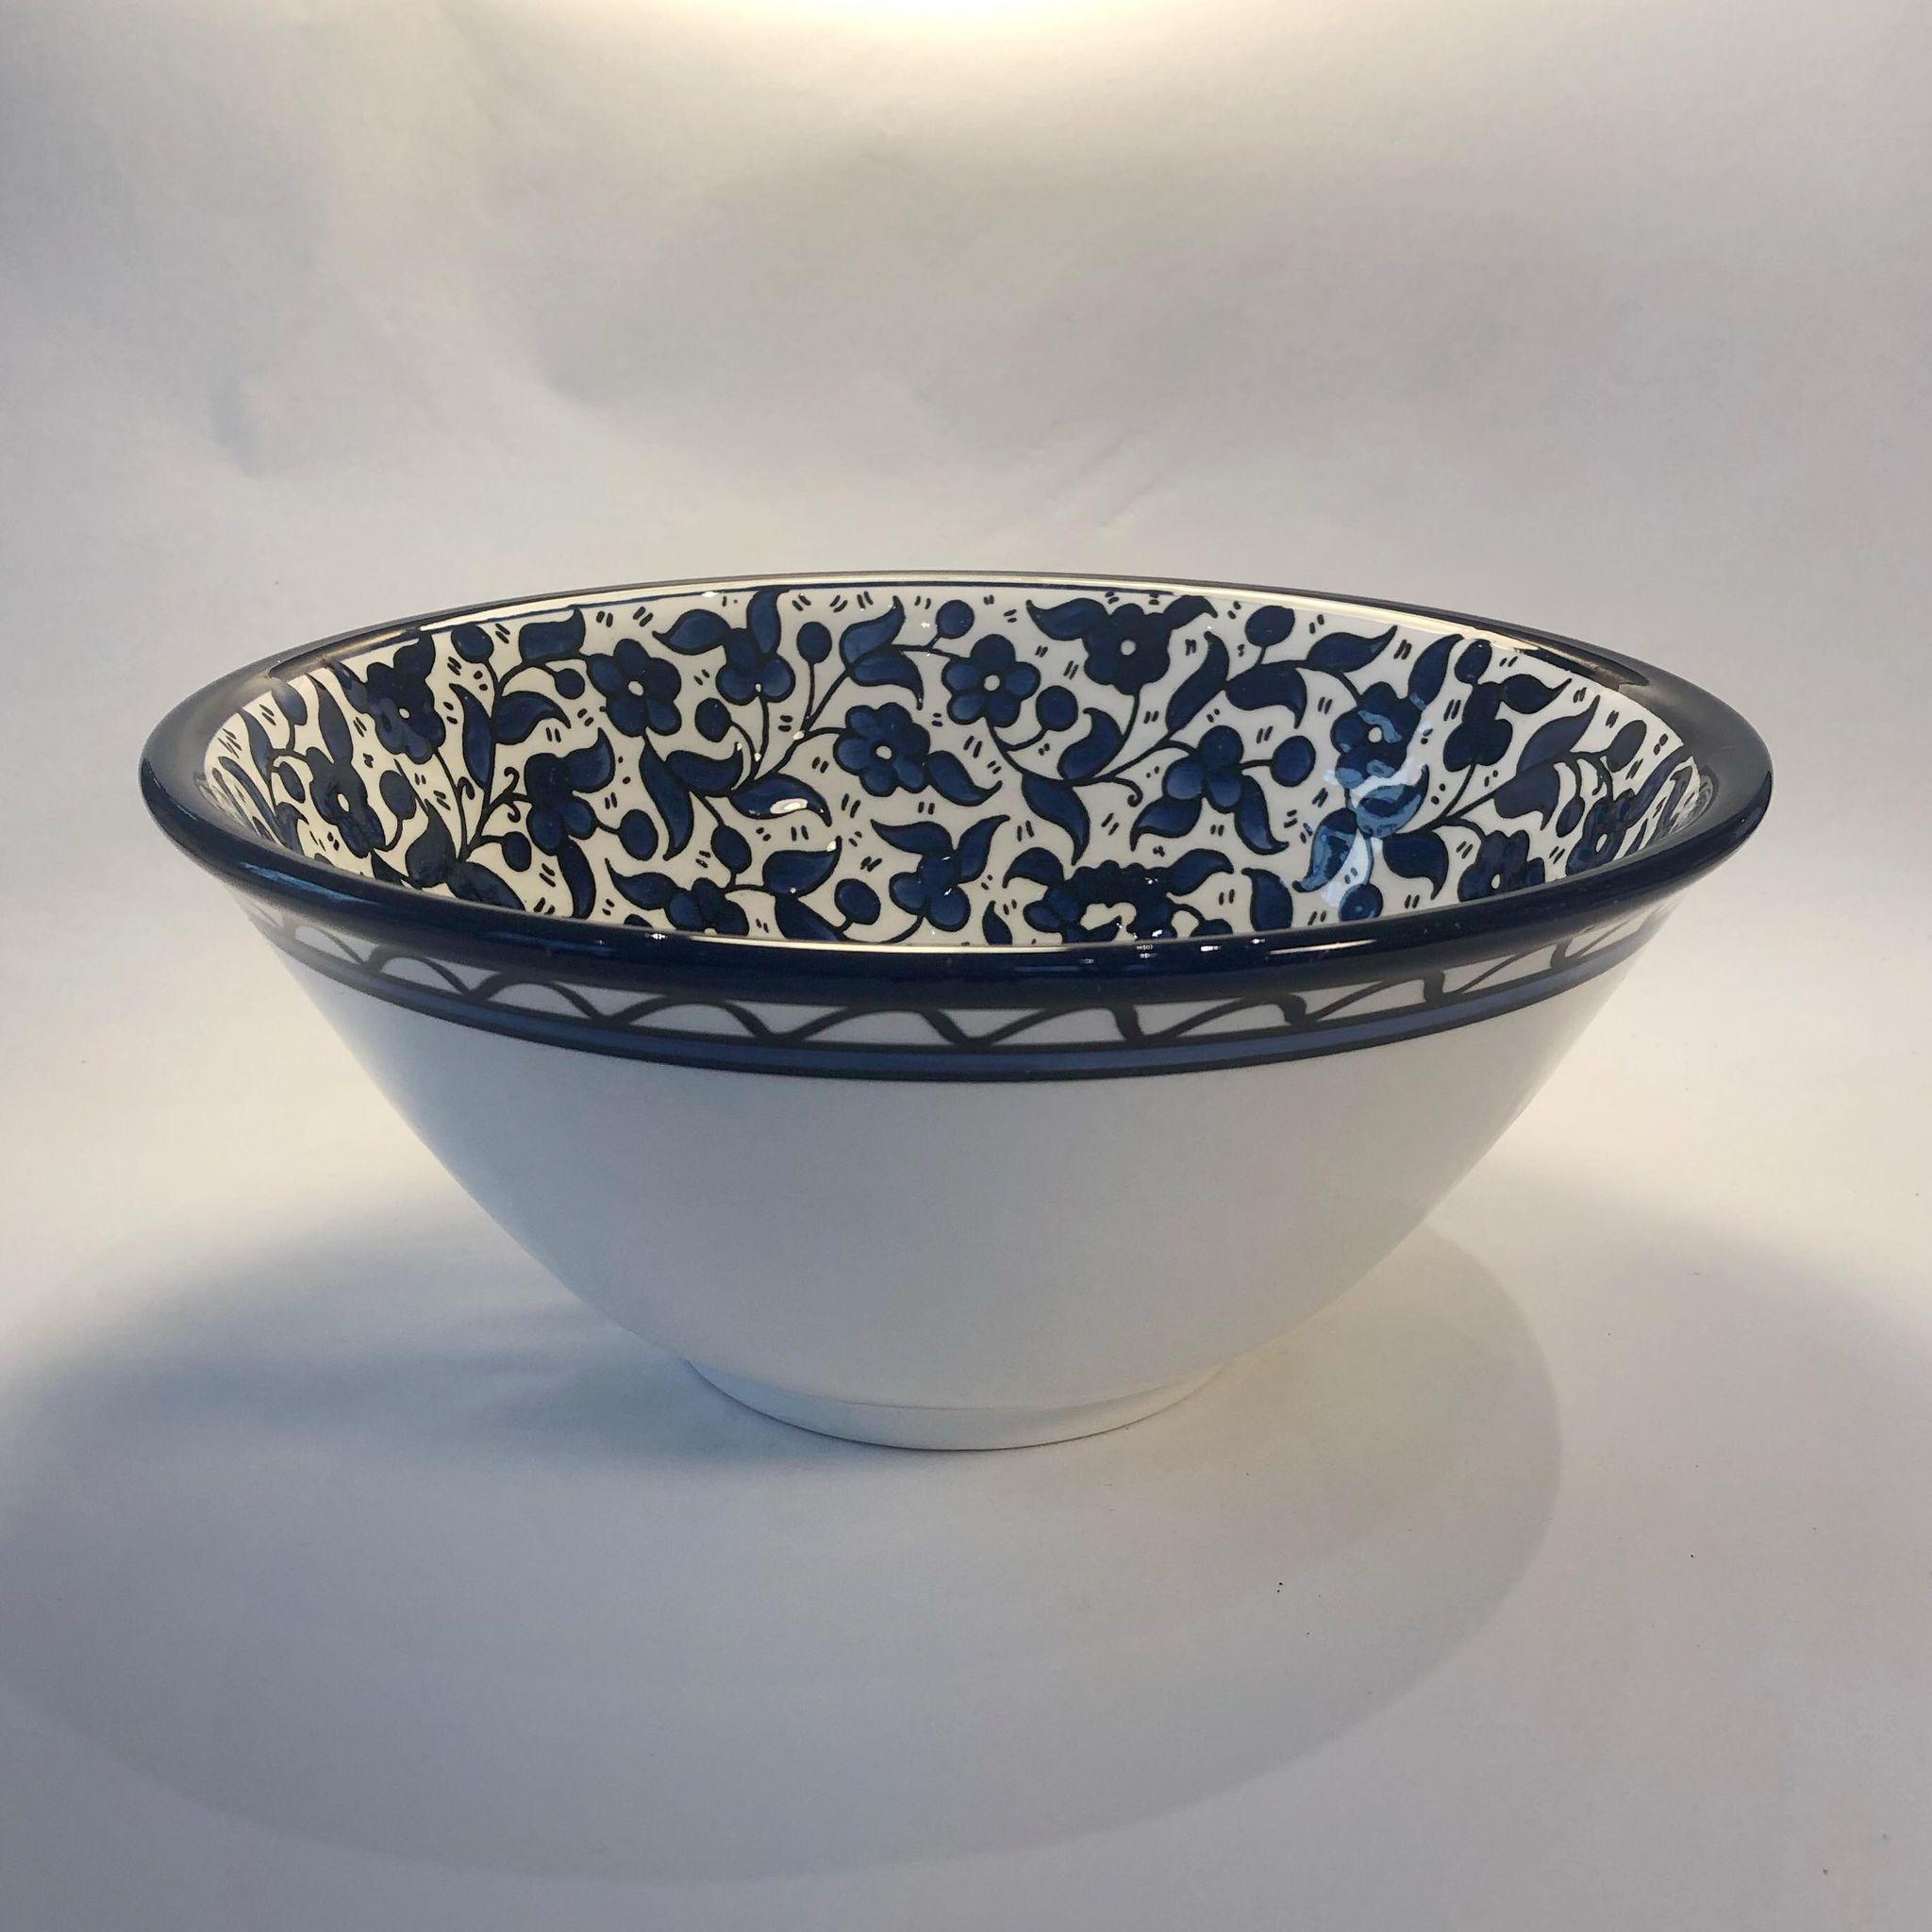 Salatbolle, keramikk. Blå